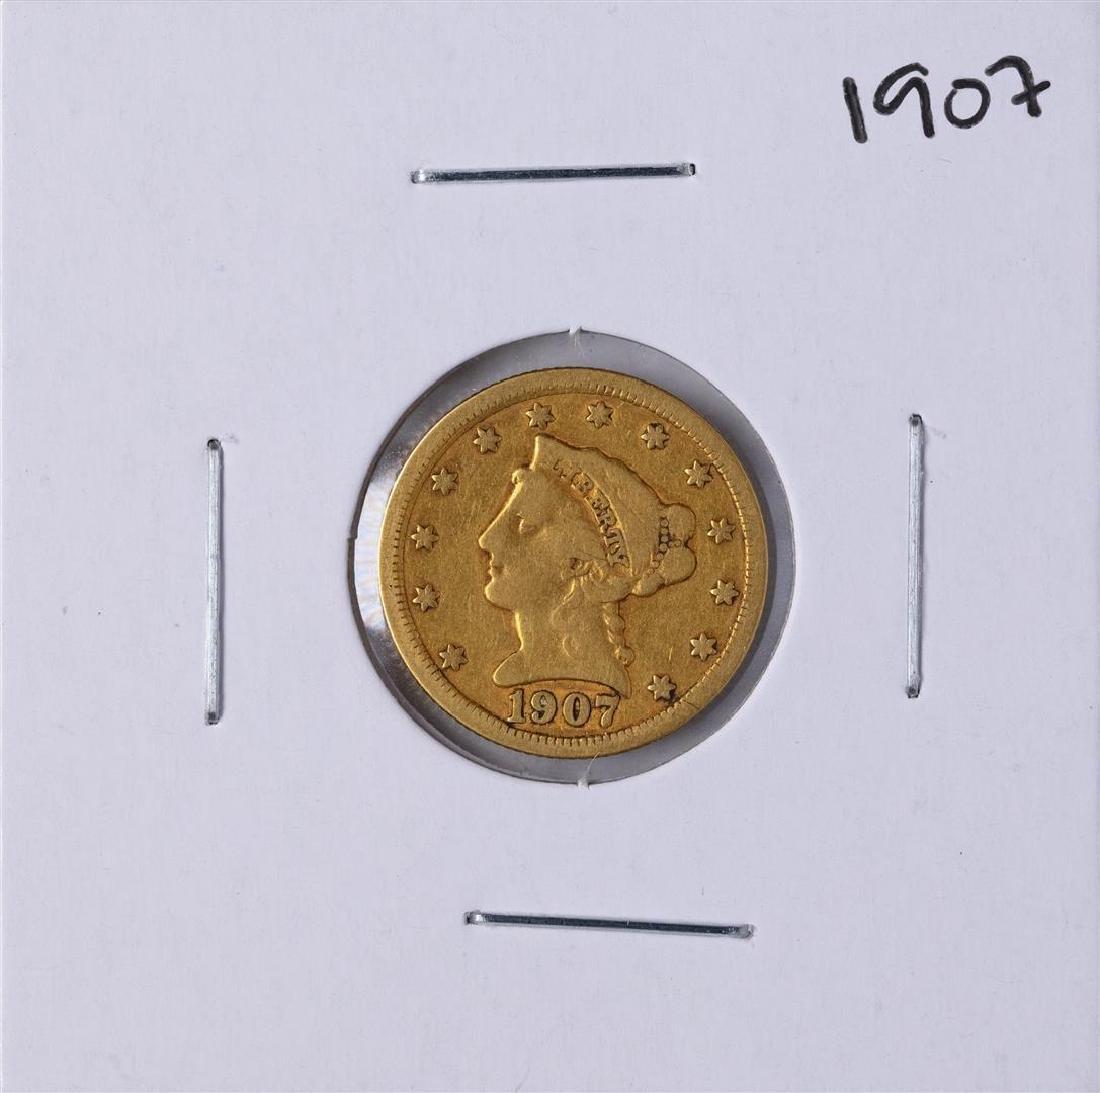 1907 $2 1/2 Liberty Head Quarter Eagle Gold Coin